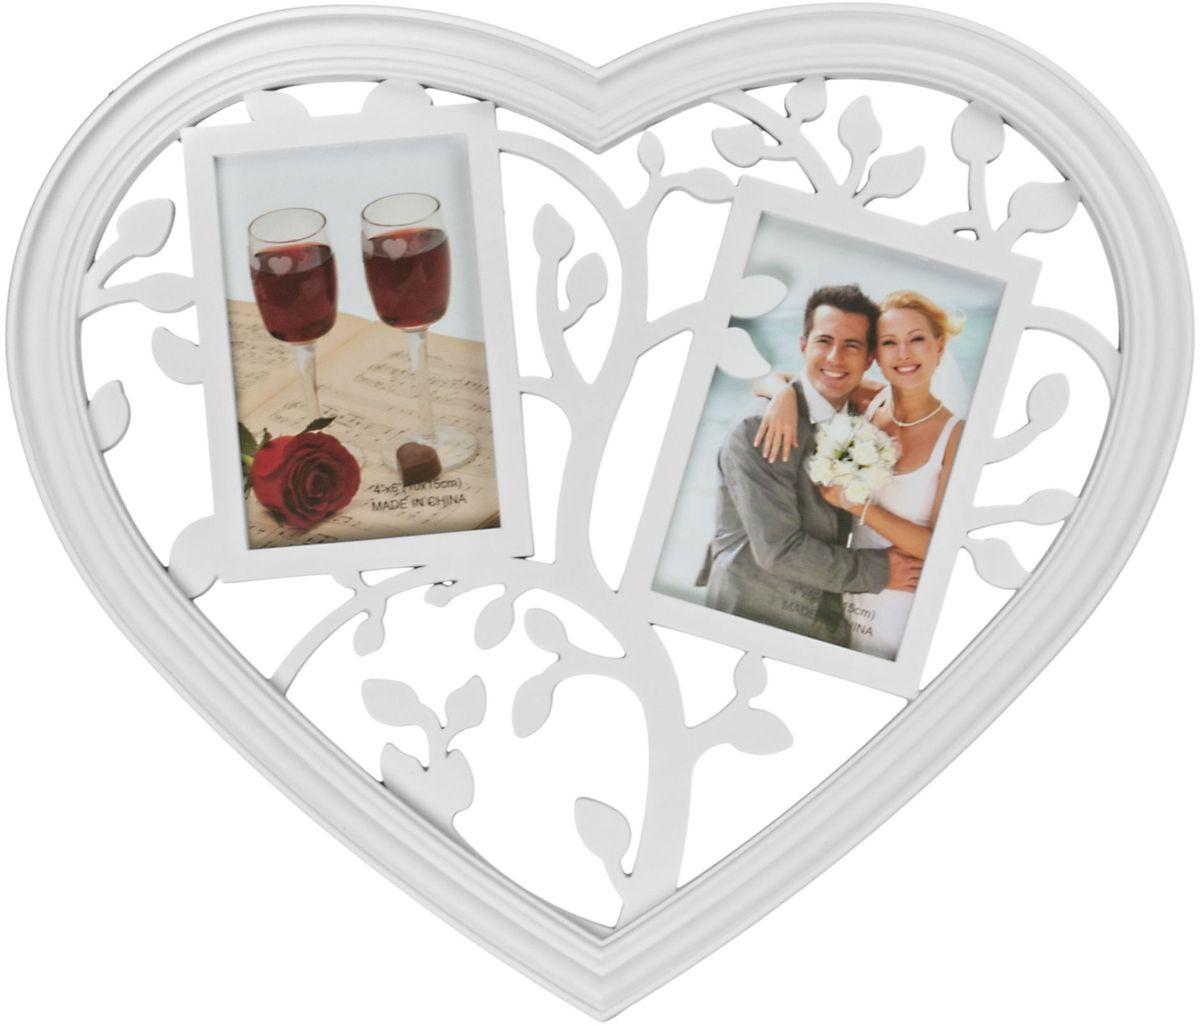 Коллаж Platinum Сердце, цвет: белый, 2 фоторамки. BIN-1123400BIN-1123400-White-БелыйПластиковый коллаж с 2 фото 10х15 см.